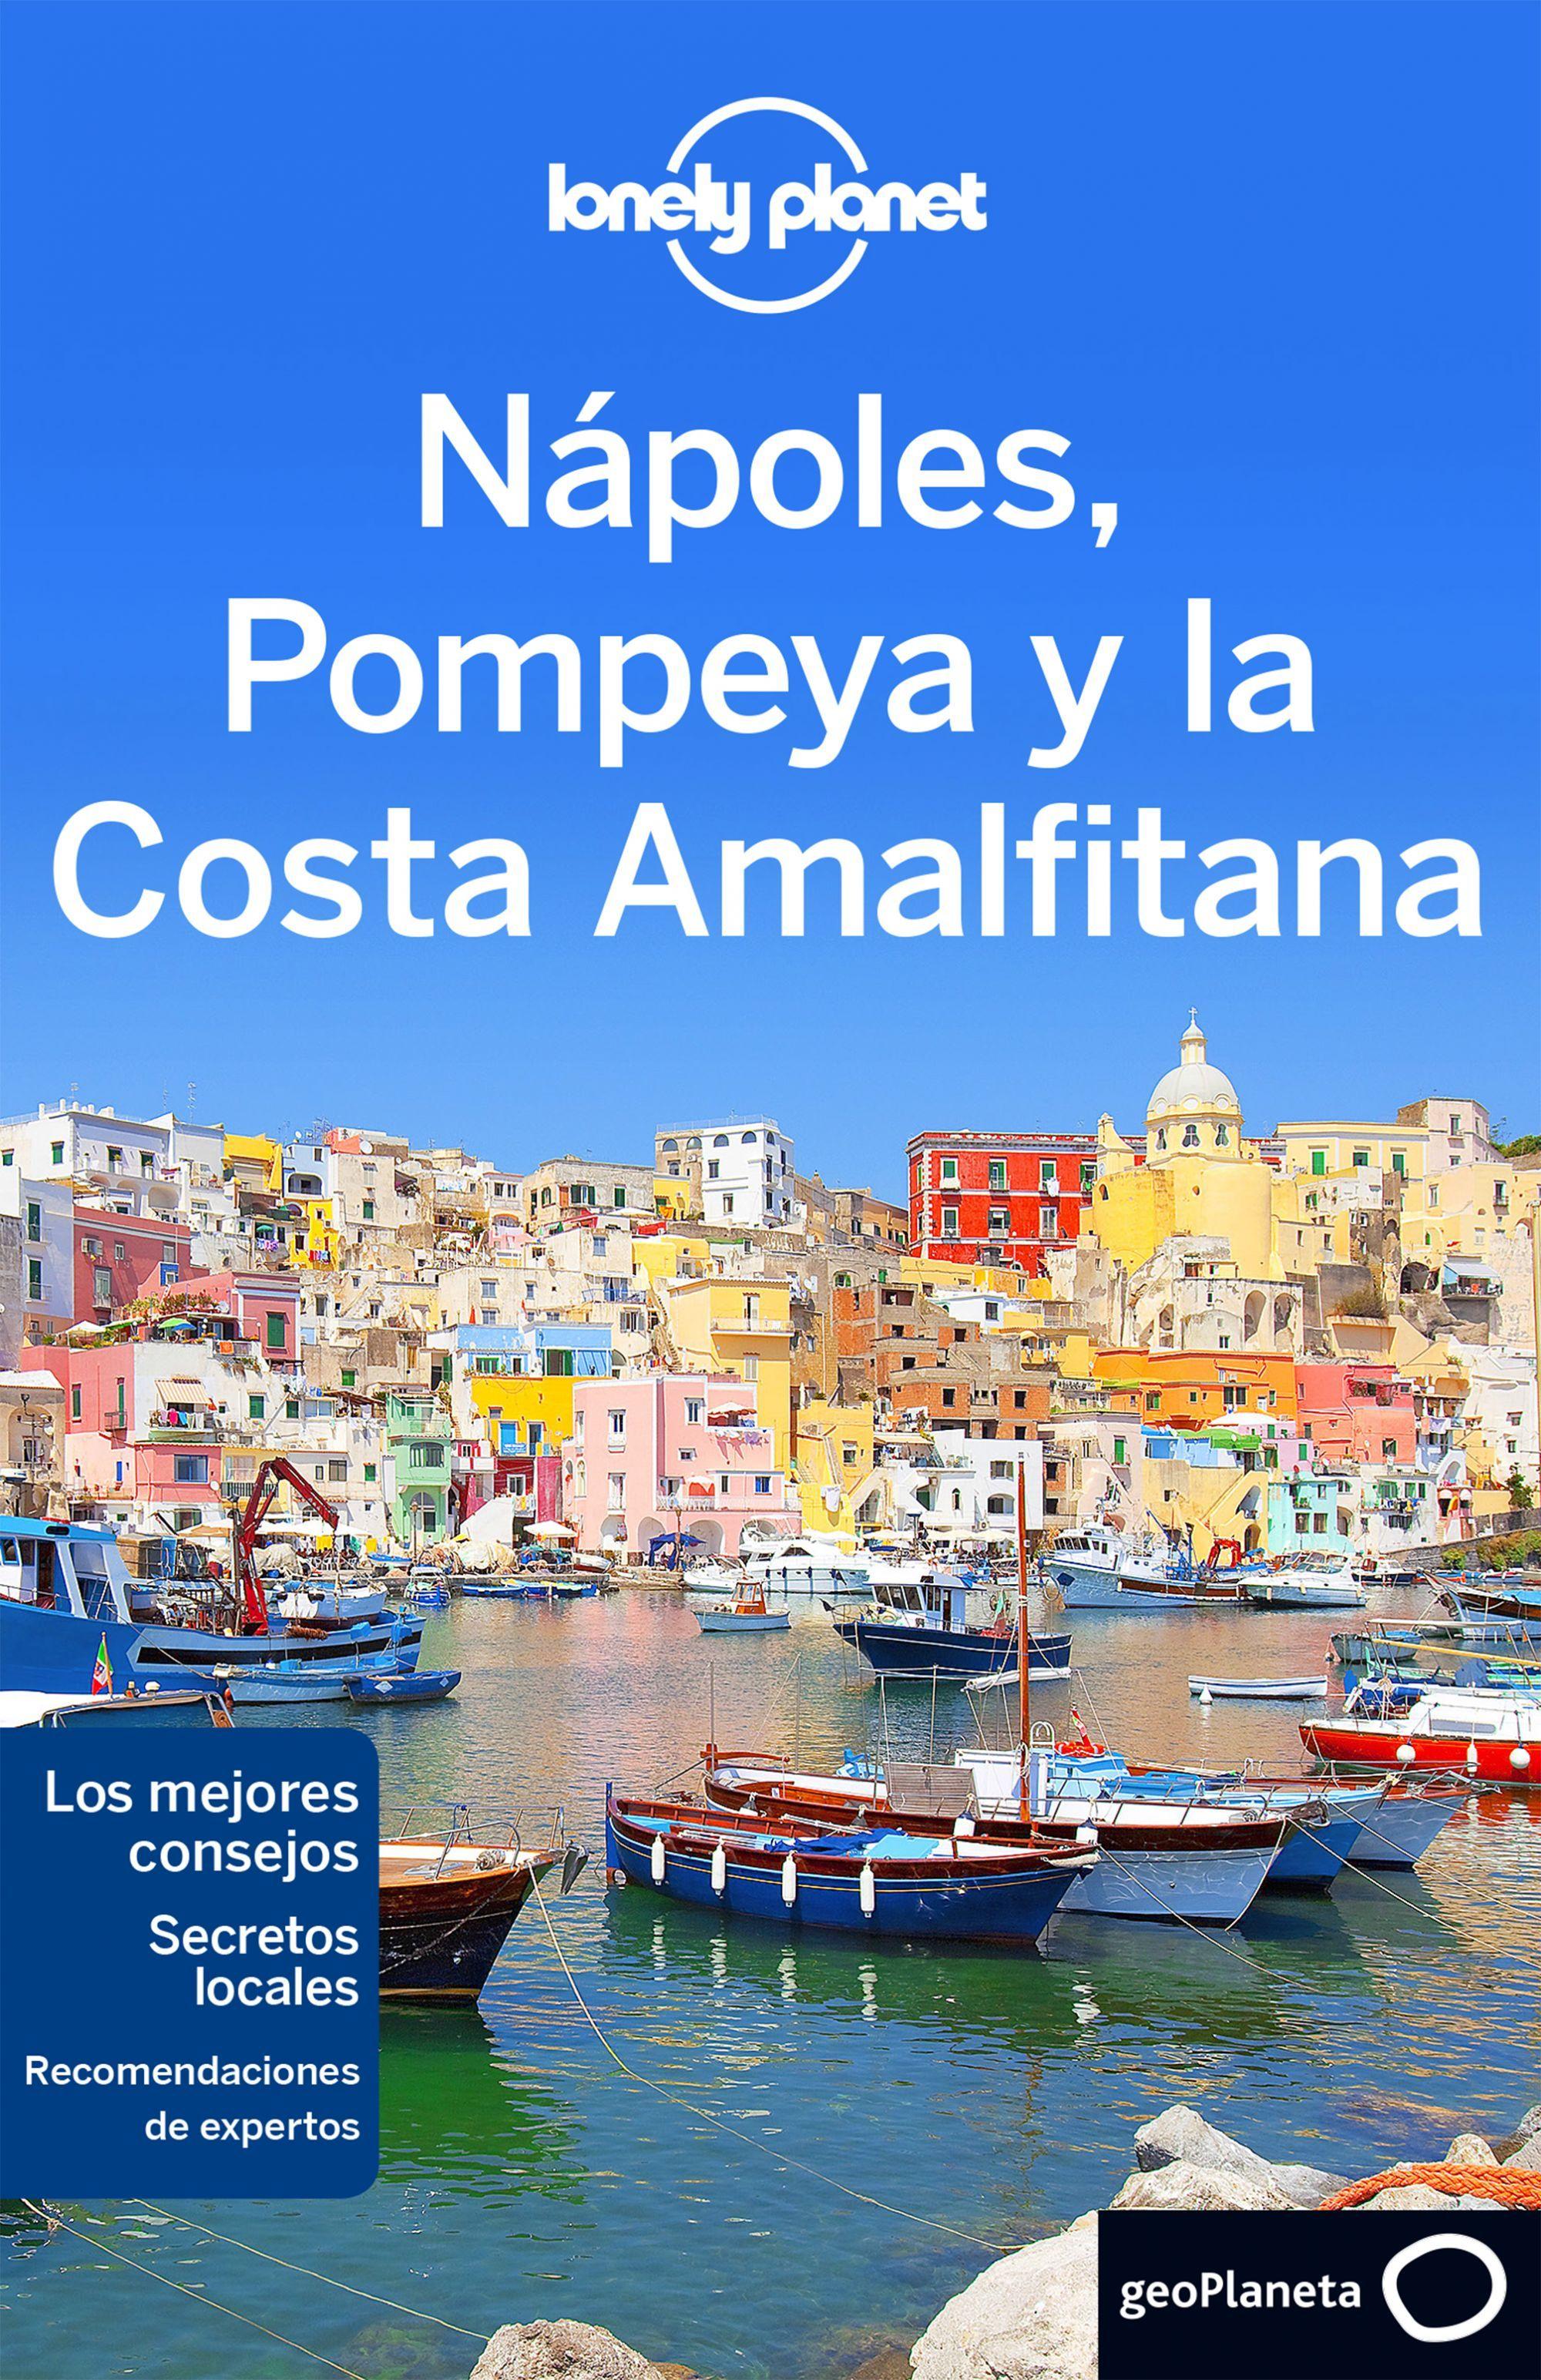 NAPOLES, POMPEYA Y LA COSTA AMALFITANA 2